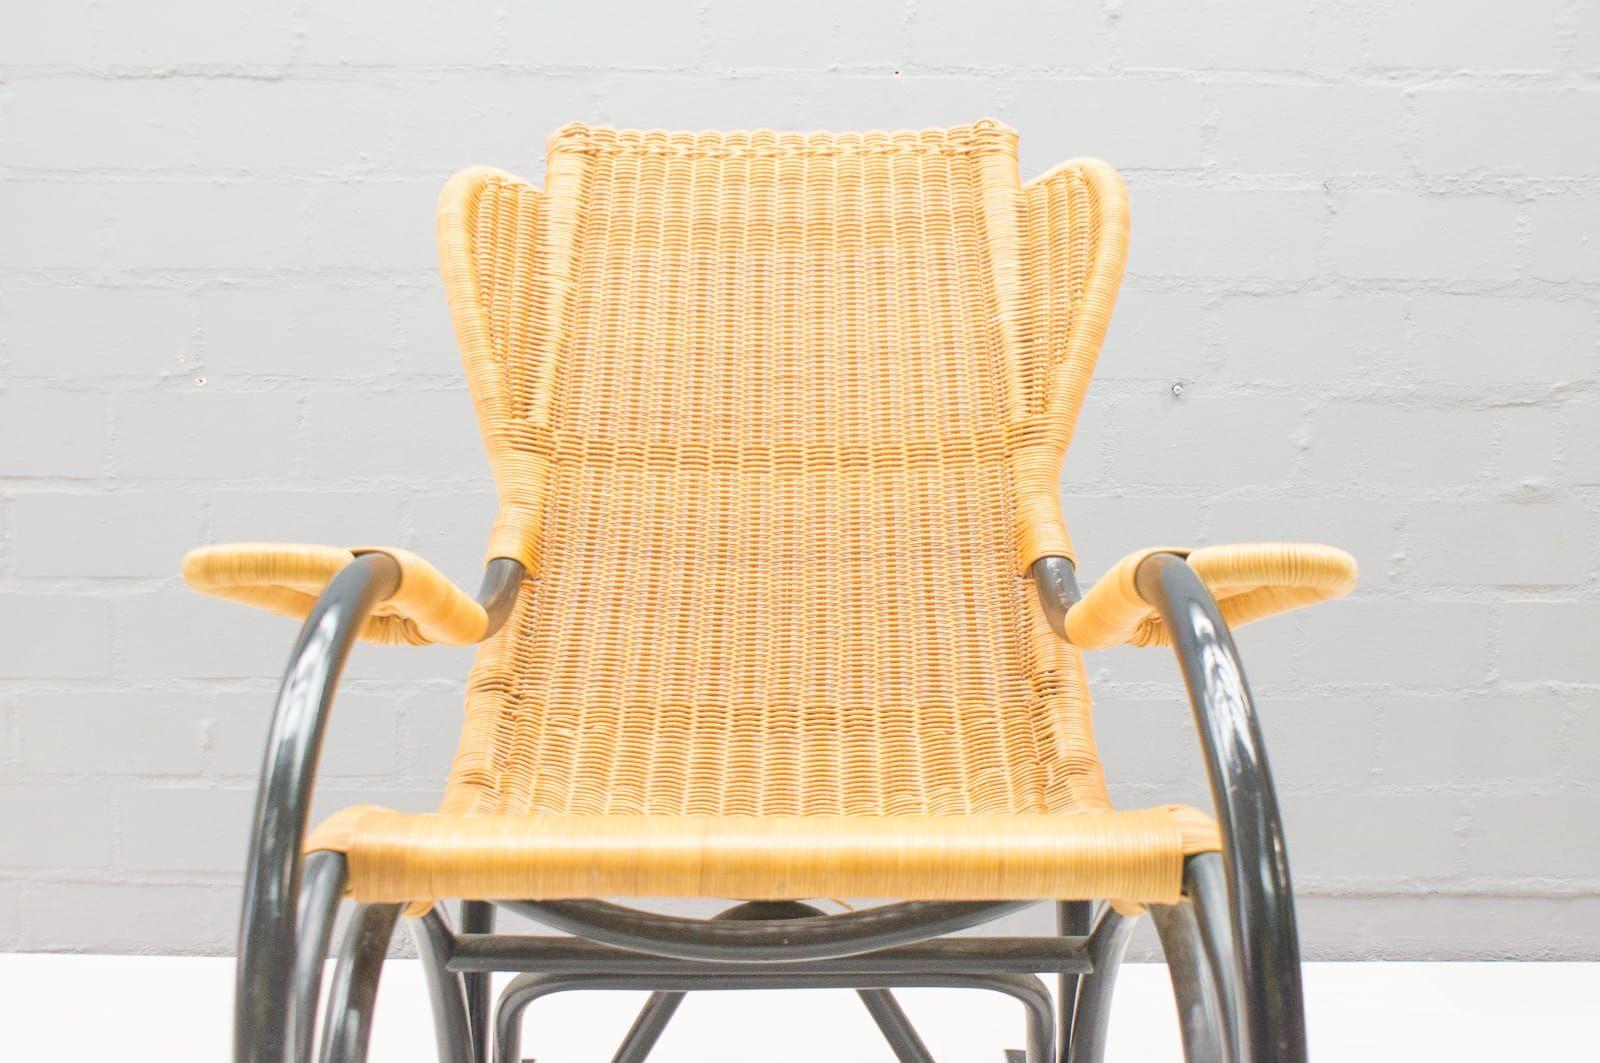 rocking chair vintage en rotin 1970s en vente sur pamono. Black Bedroom Furniture Sets. Home Design Ideas